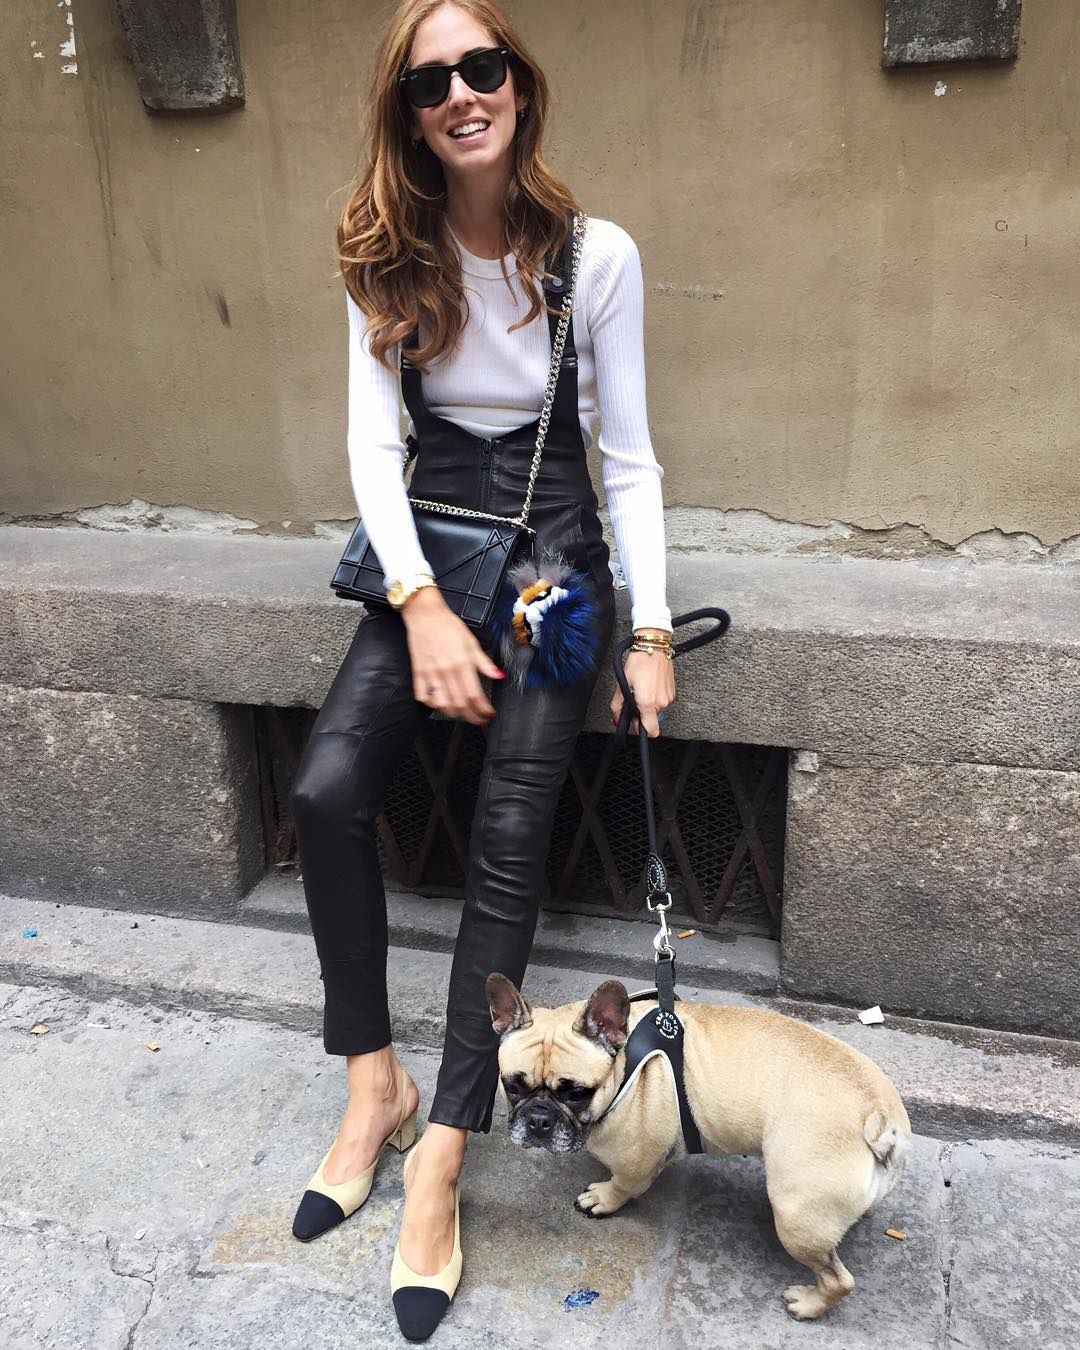 Hacked Chiara Ferragni nudes (24 photos), Tits, Fappening, Feet, legs 2020